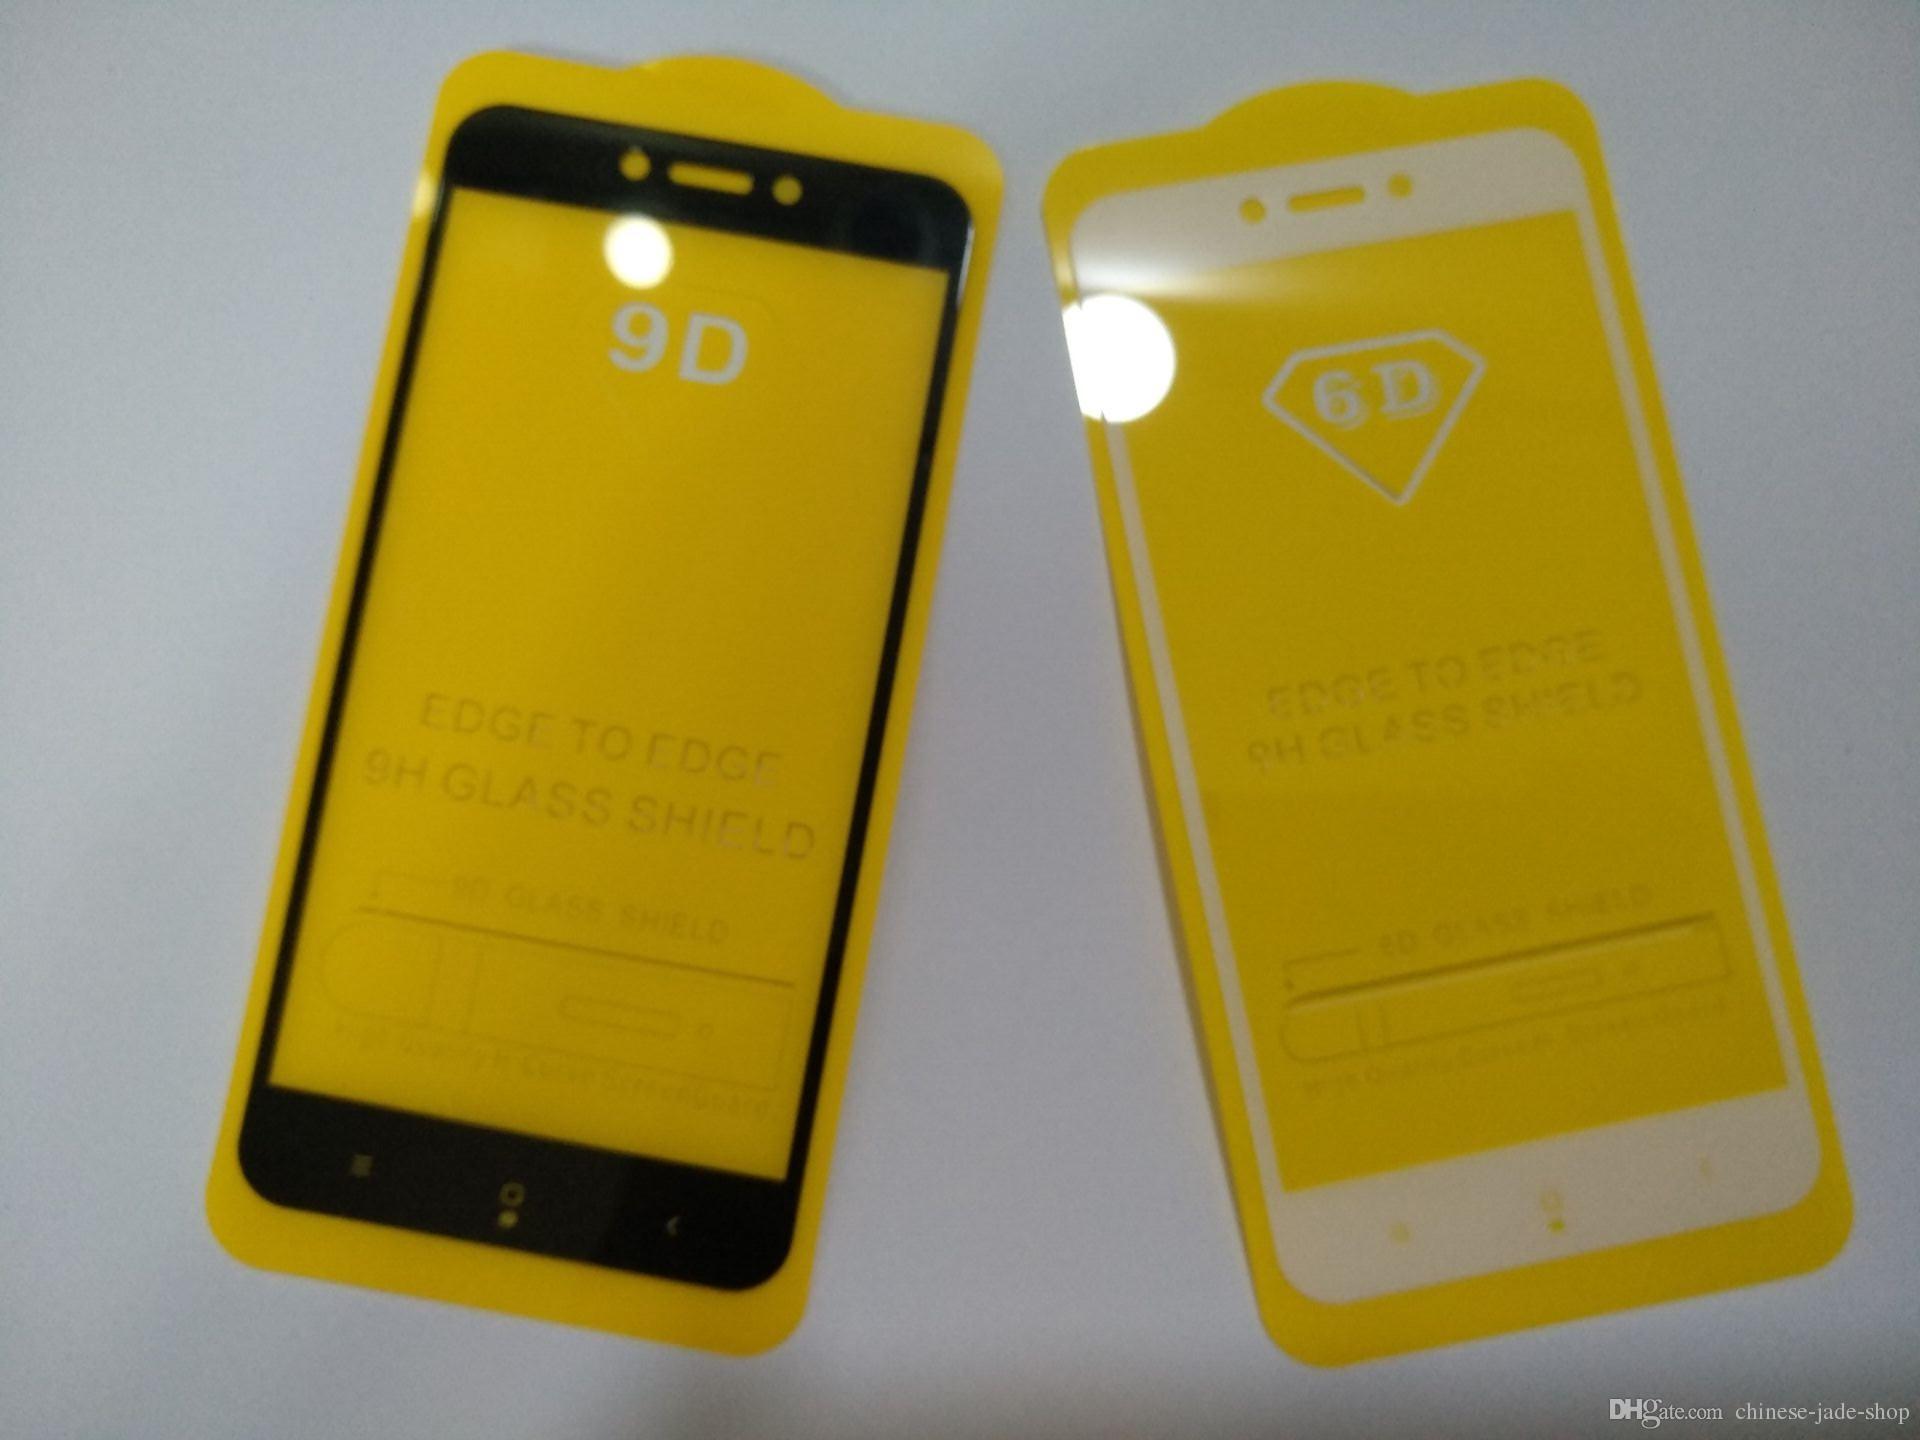 LG G7 Q7スタイル4 Q6 X Power 3 200ピー/ロットのためのフルカバー21D 9Dの強化ガラススクリーンプロテクターAB接着剤